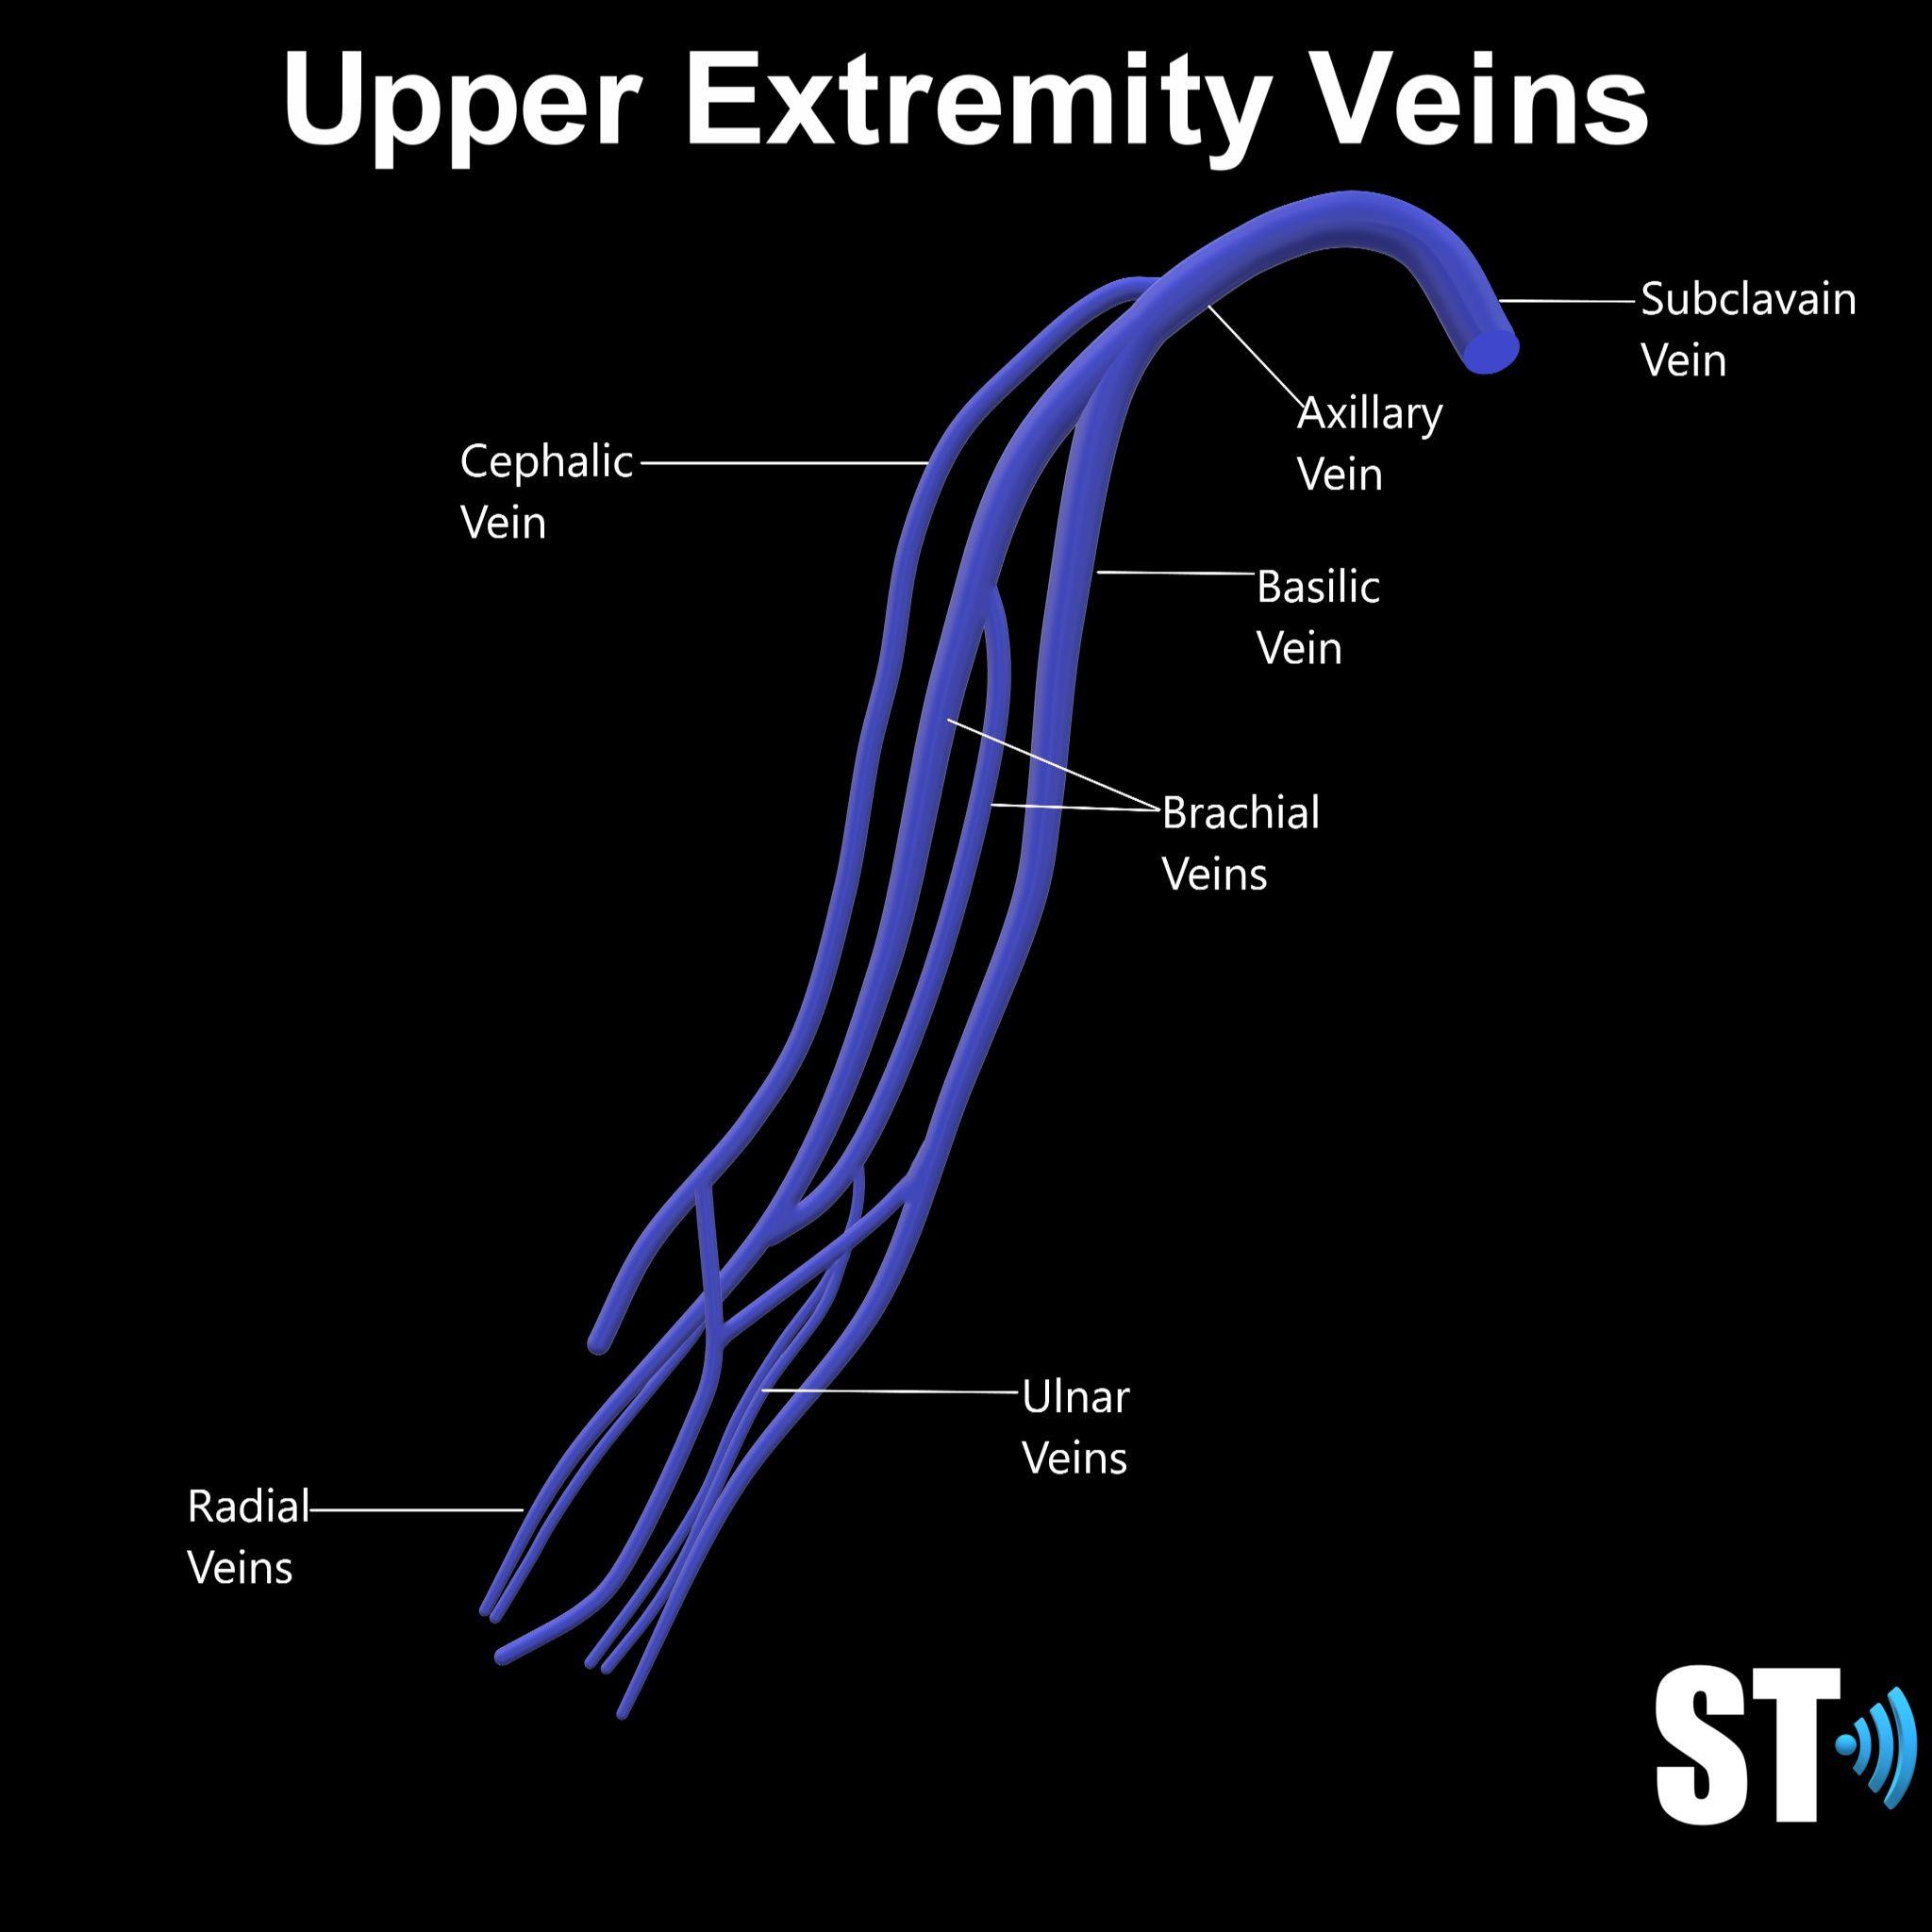 Upper Extremity Venous Doppler Sonographic Tendencies In